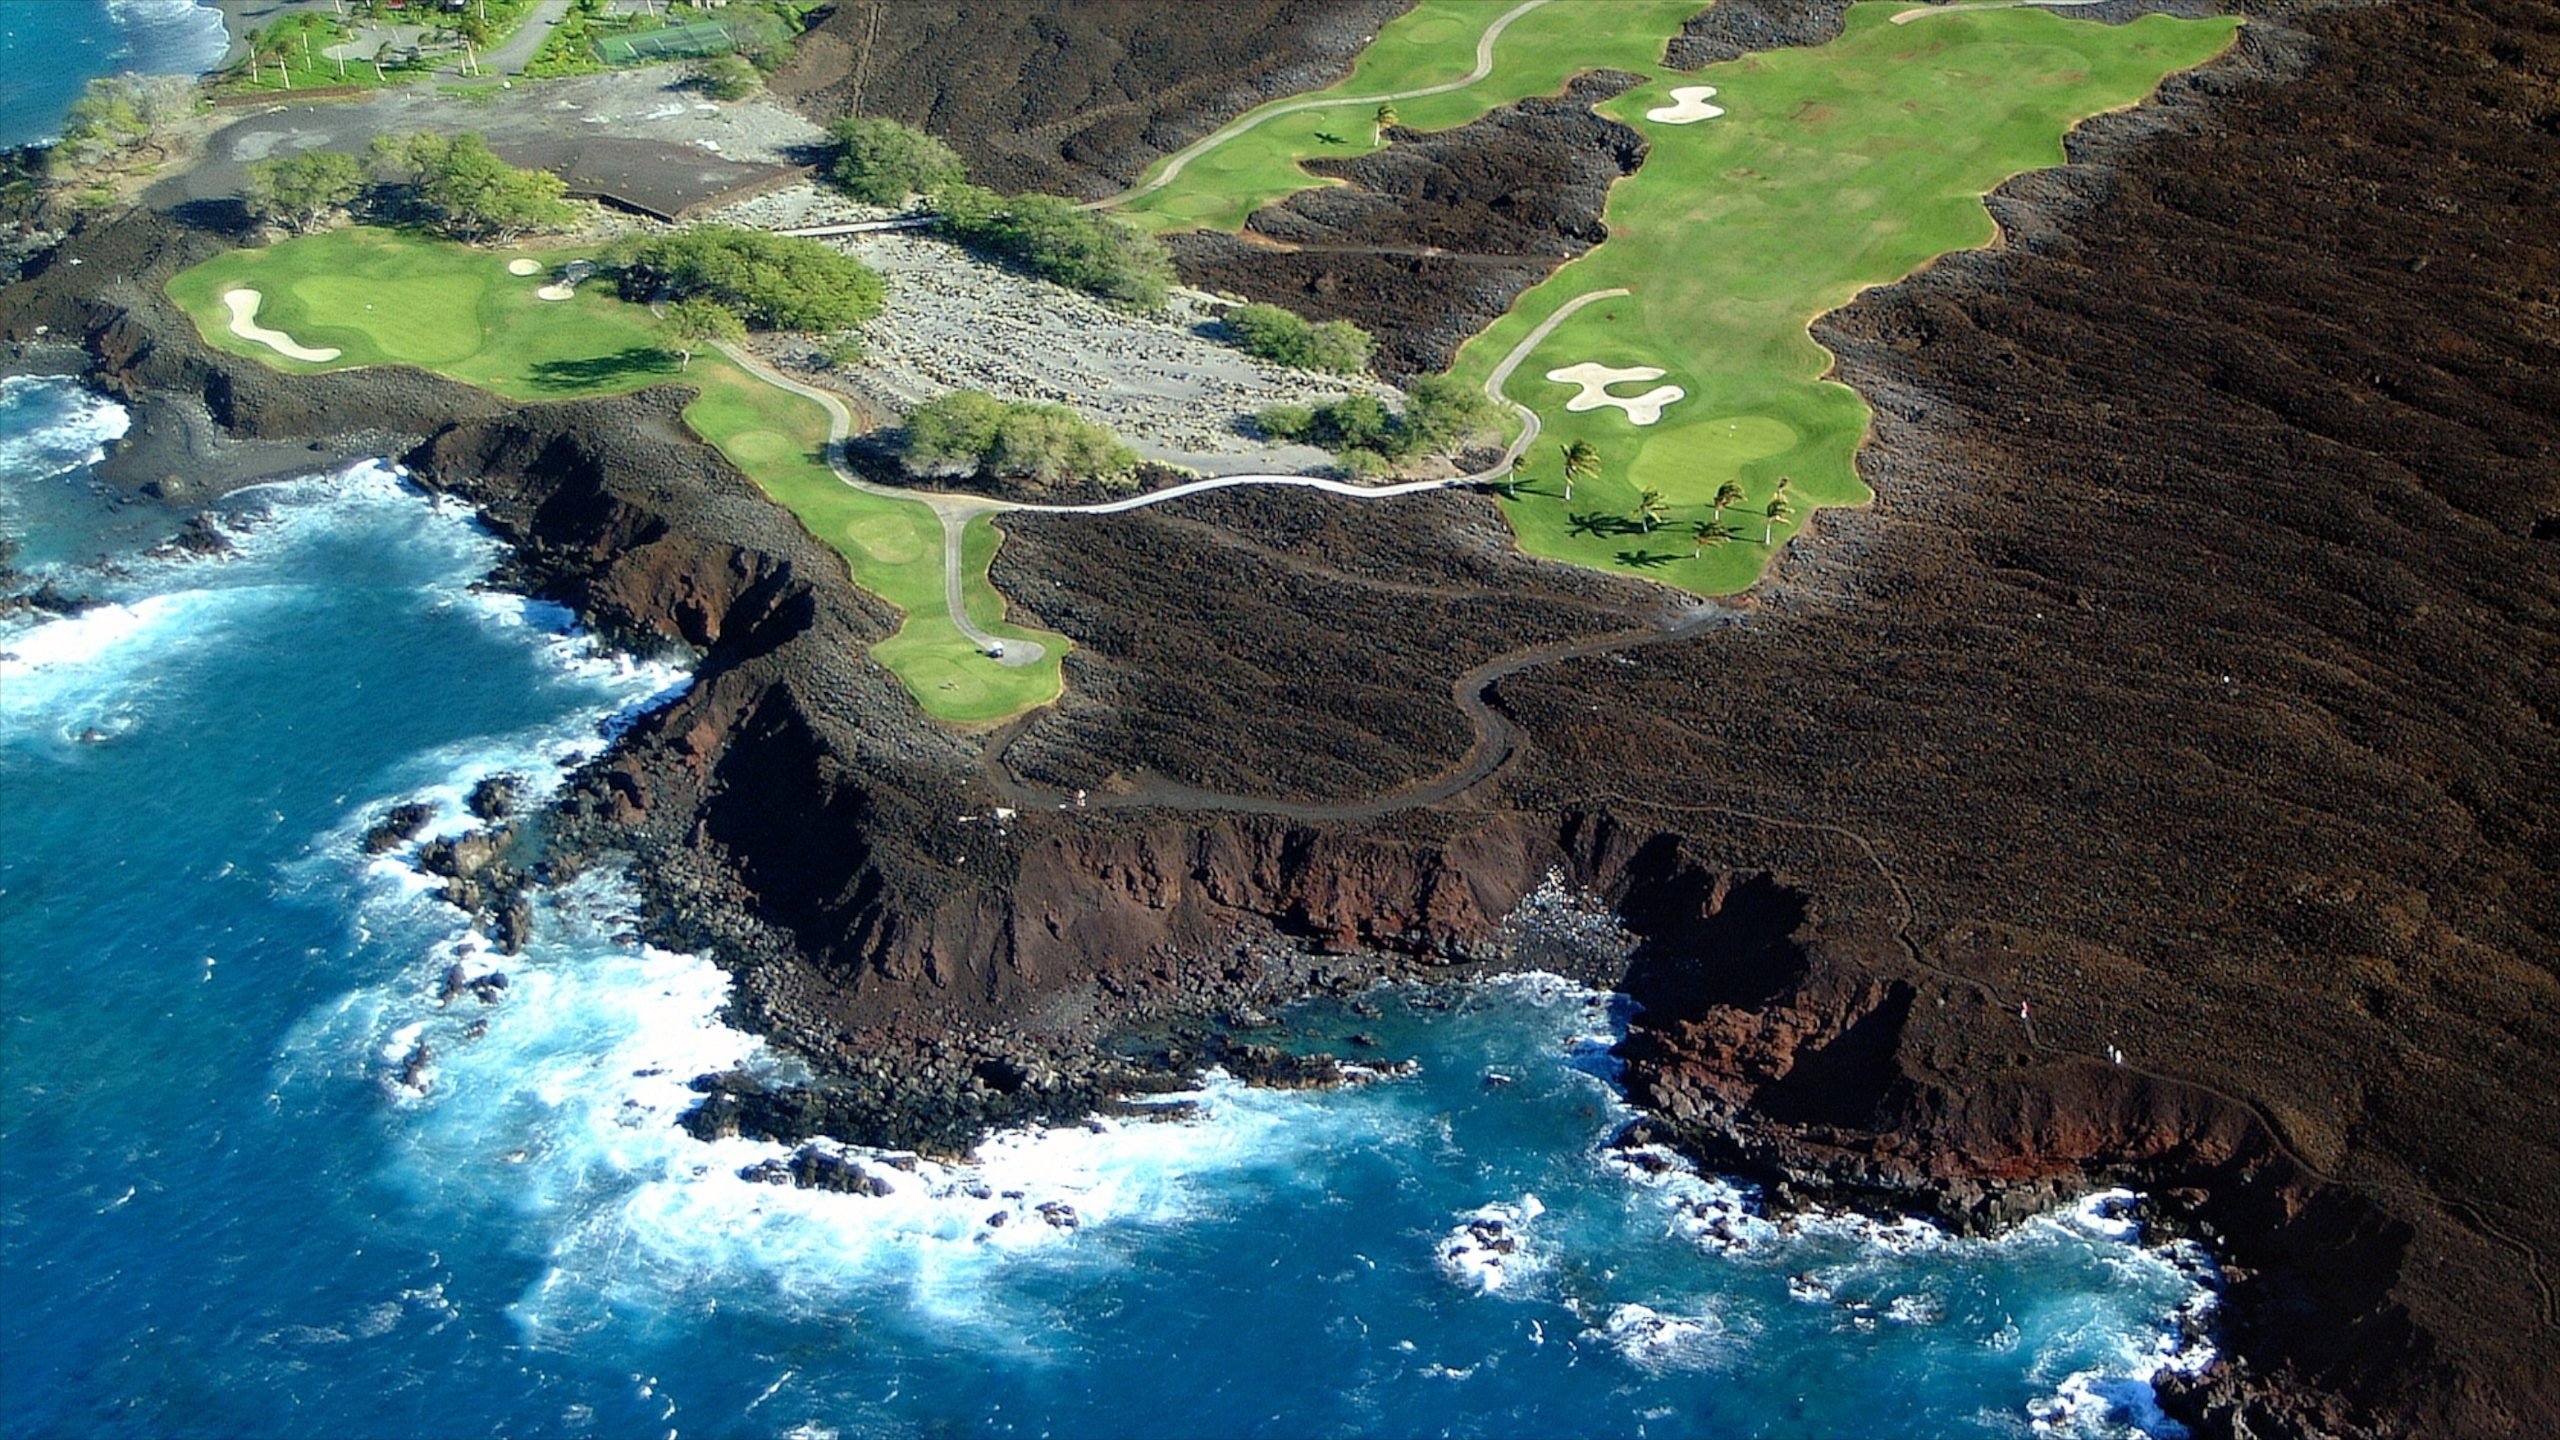 Waikoloa Village, Hawaii, United States of America